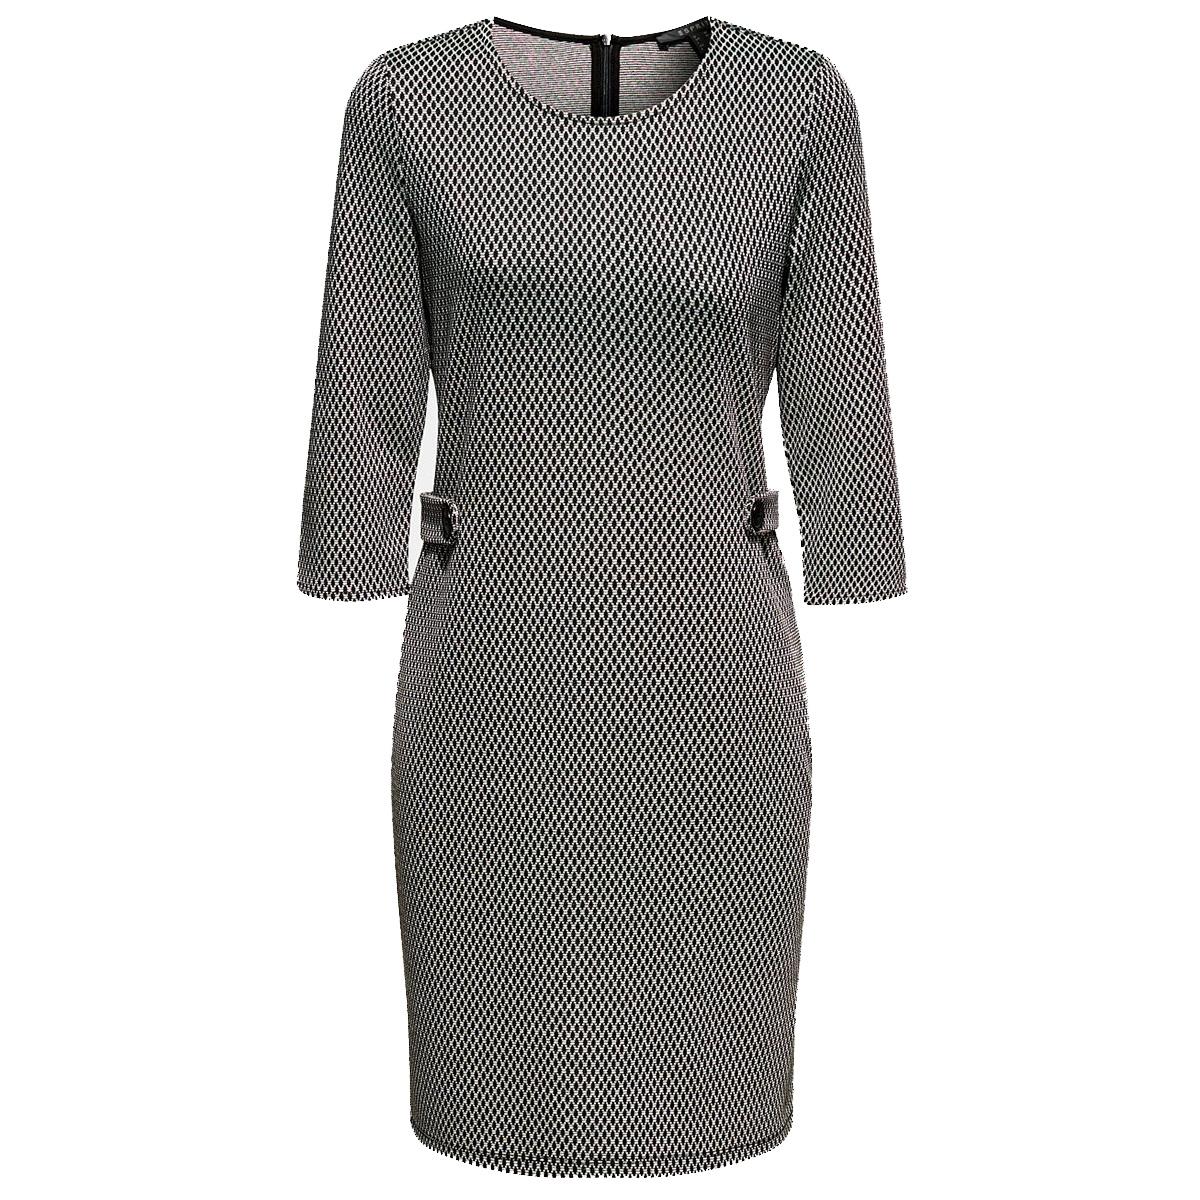 kokerjurk van jersey  met motief 119eo1e002 esprit collection jurk e030